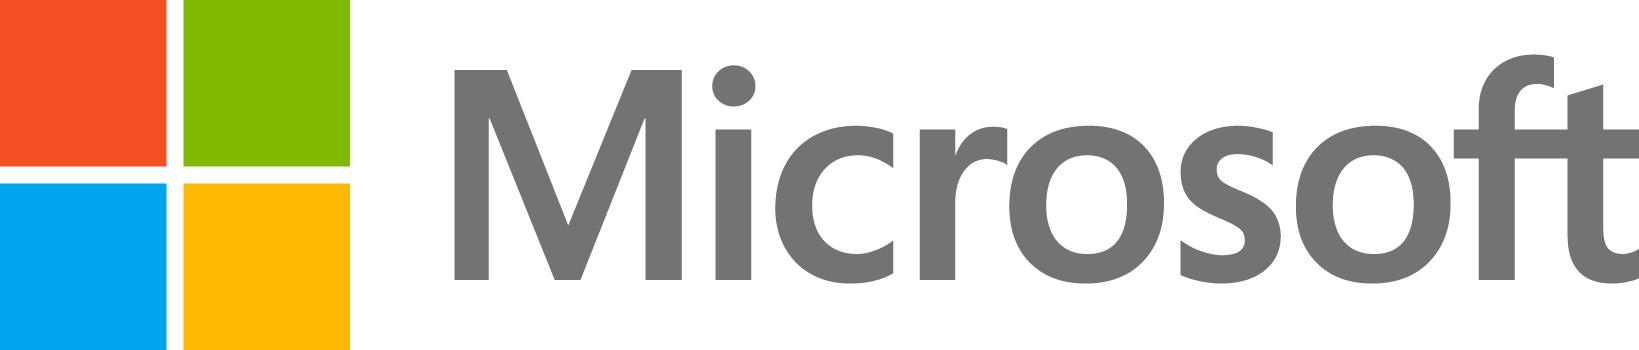 Rouen informatique - logo microsoft windows